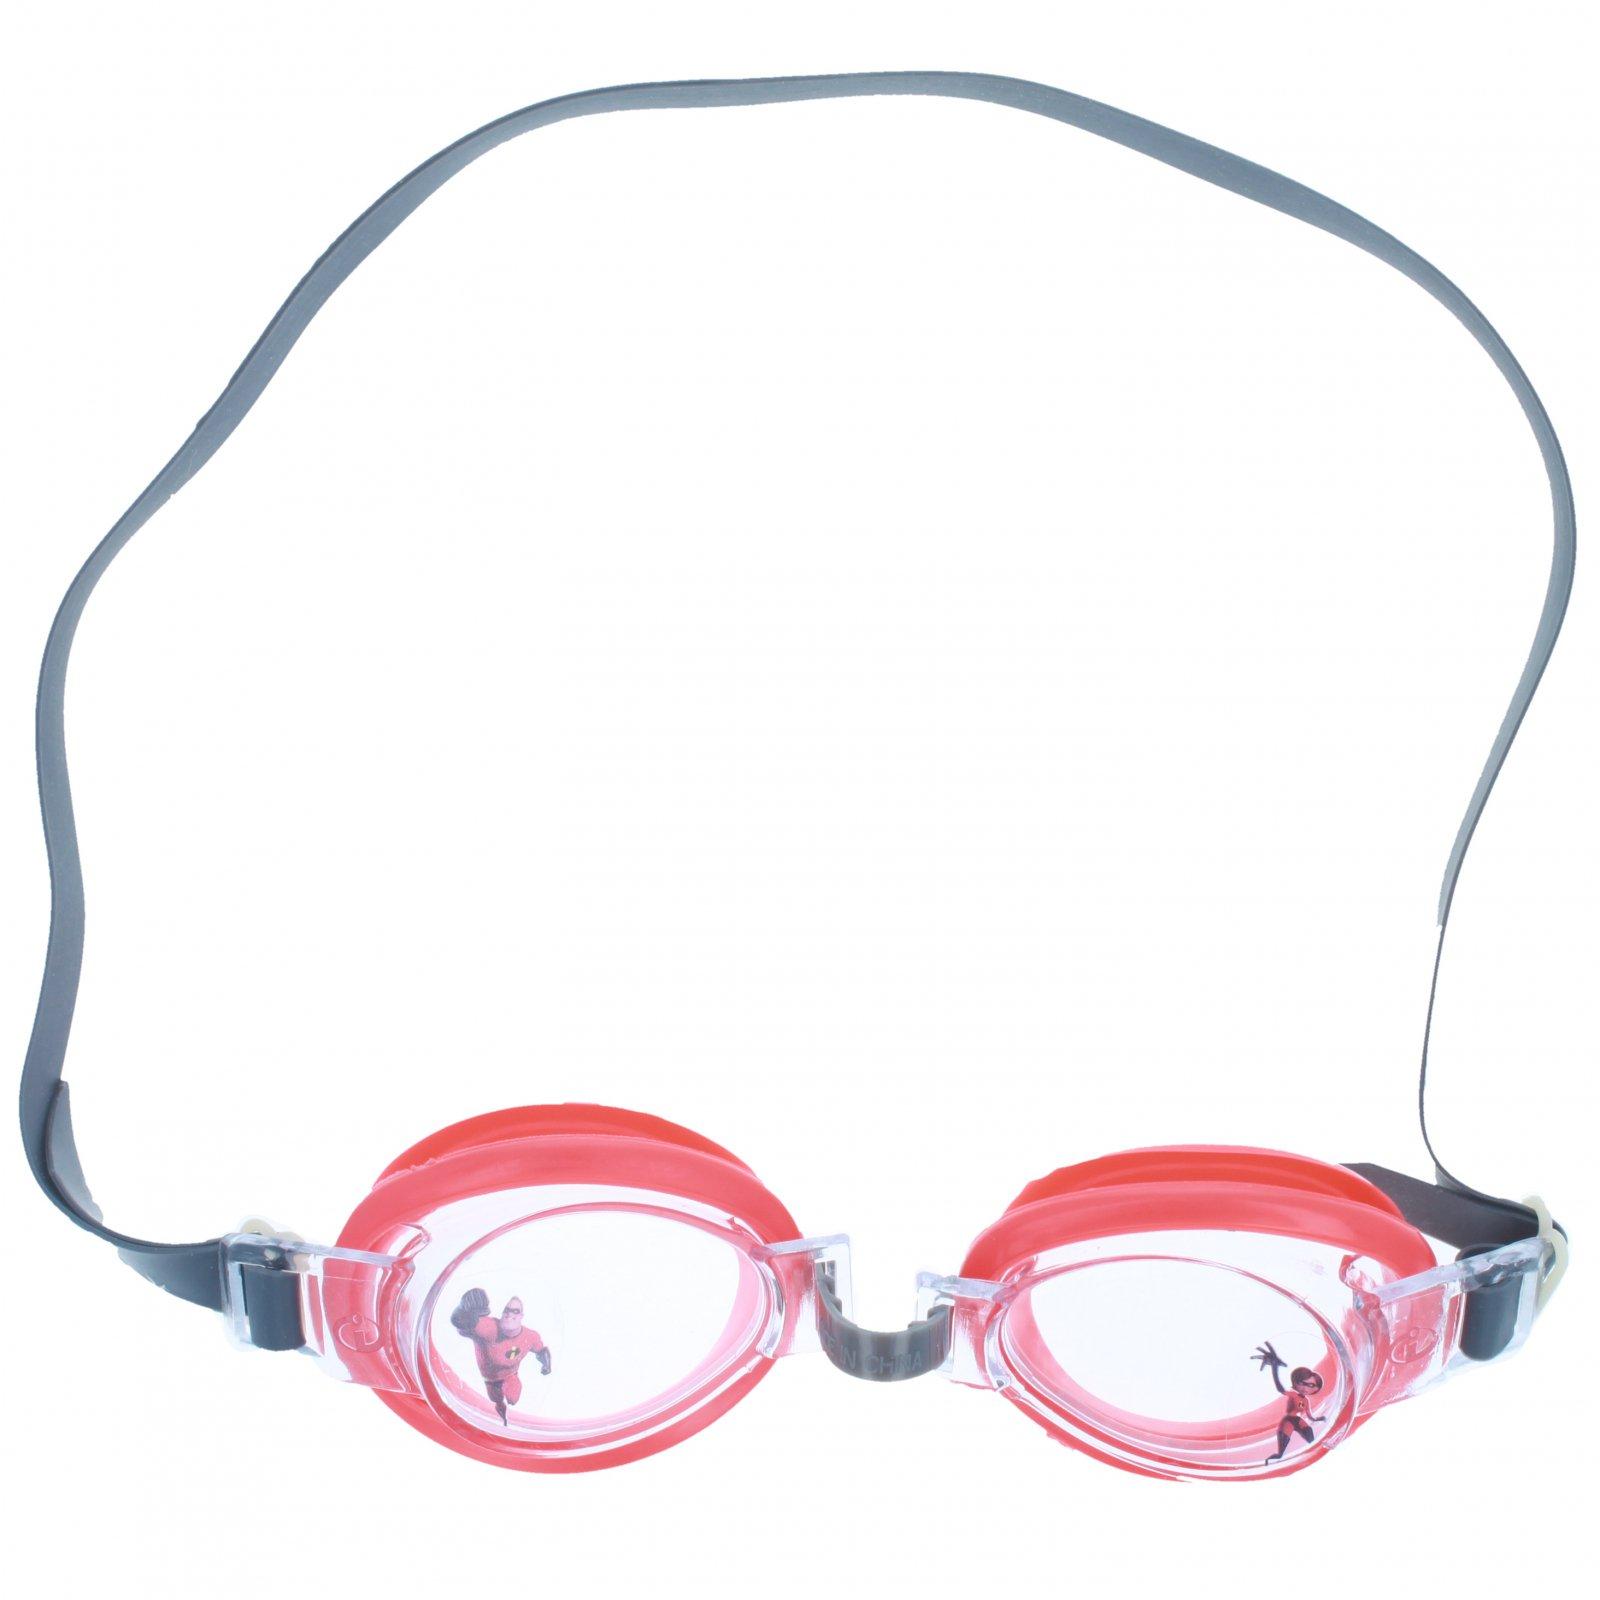 Disney Incredibles 2 Swimming Splash Goggles Kid Gear